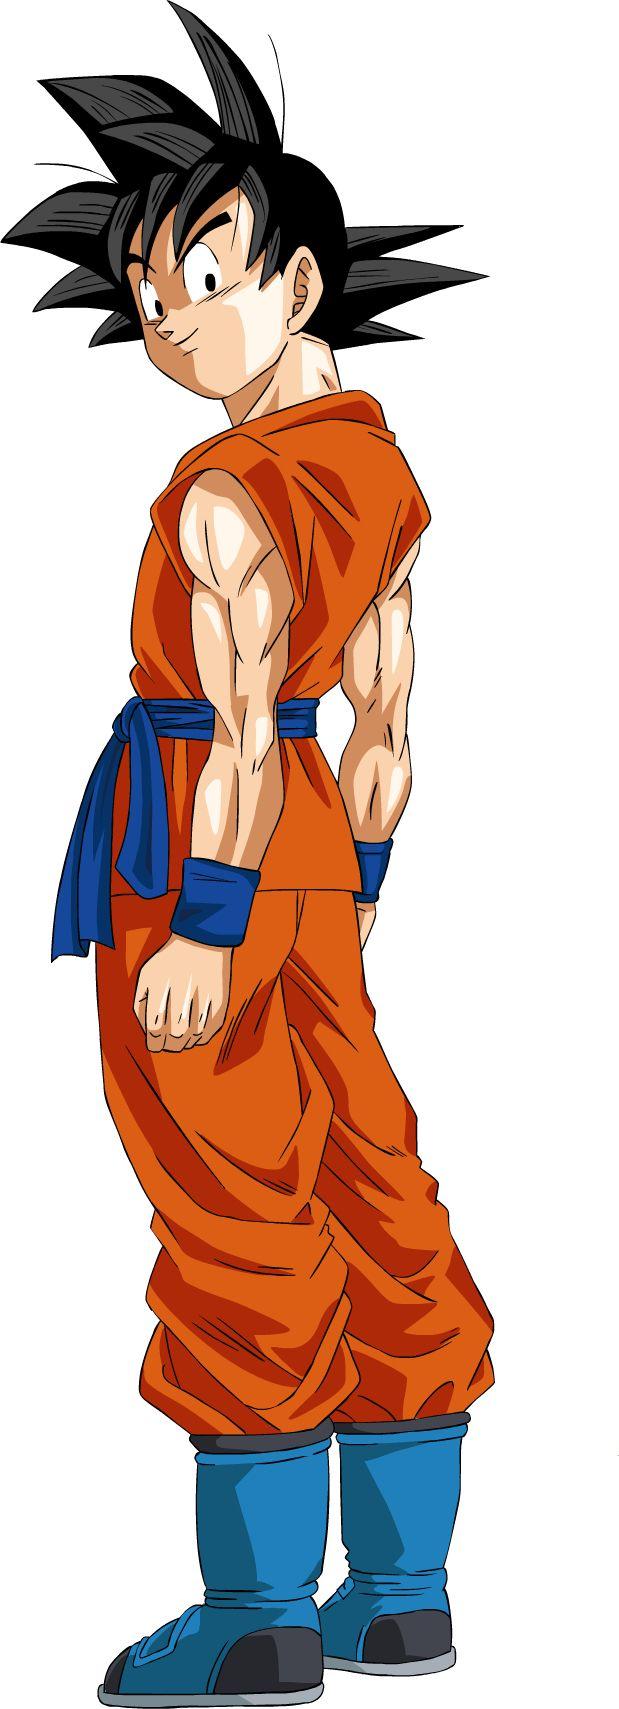 Dragon Ball Z Anime Characters : Best akira toriyama images on pinterest dragons